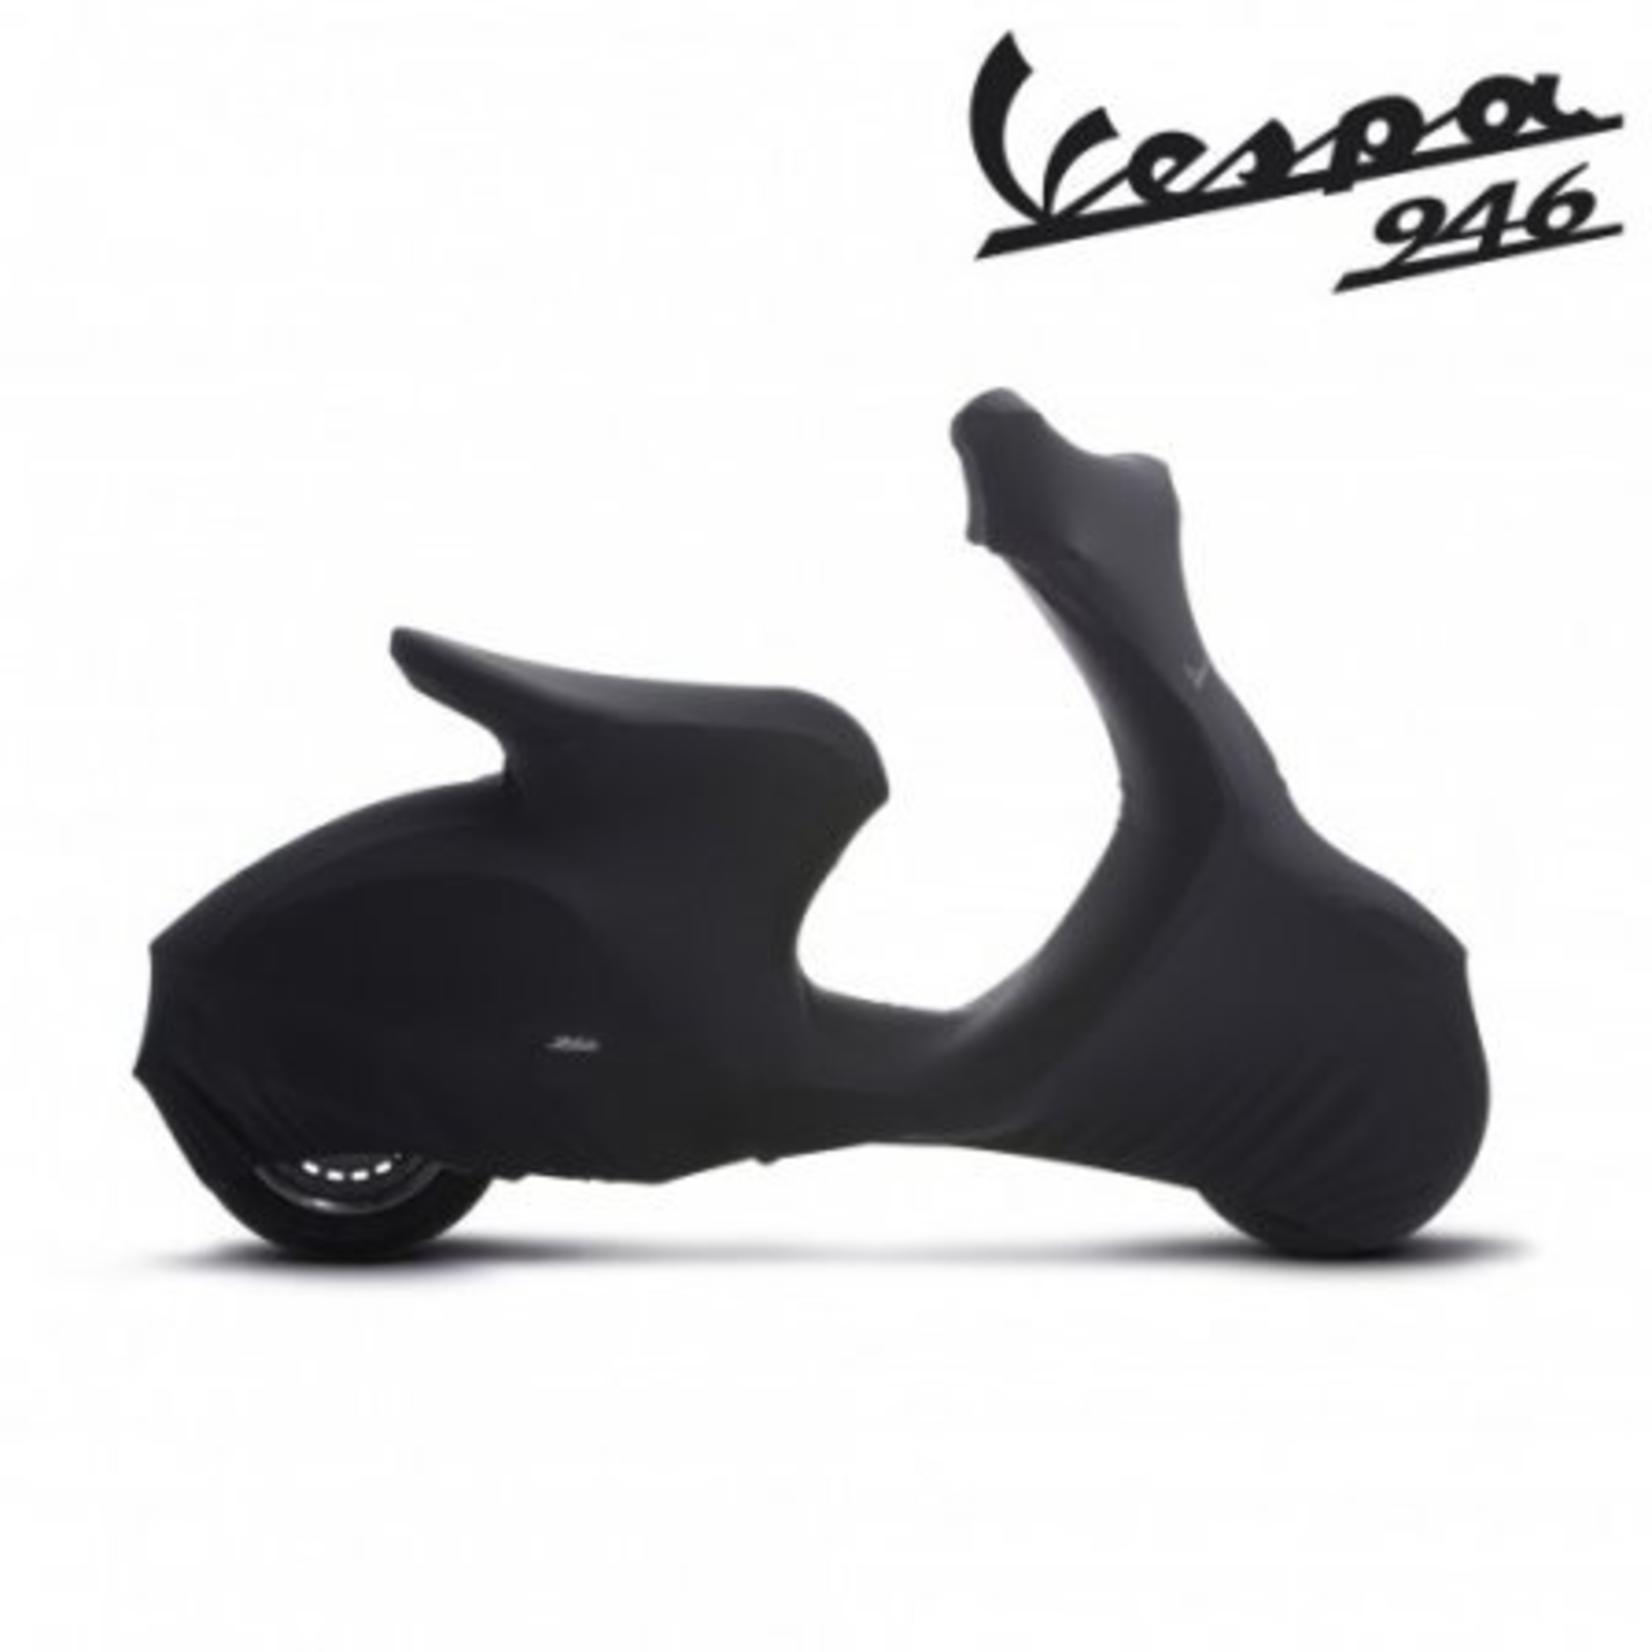 Accessories Vehicle Cover, Vespa 946